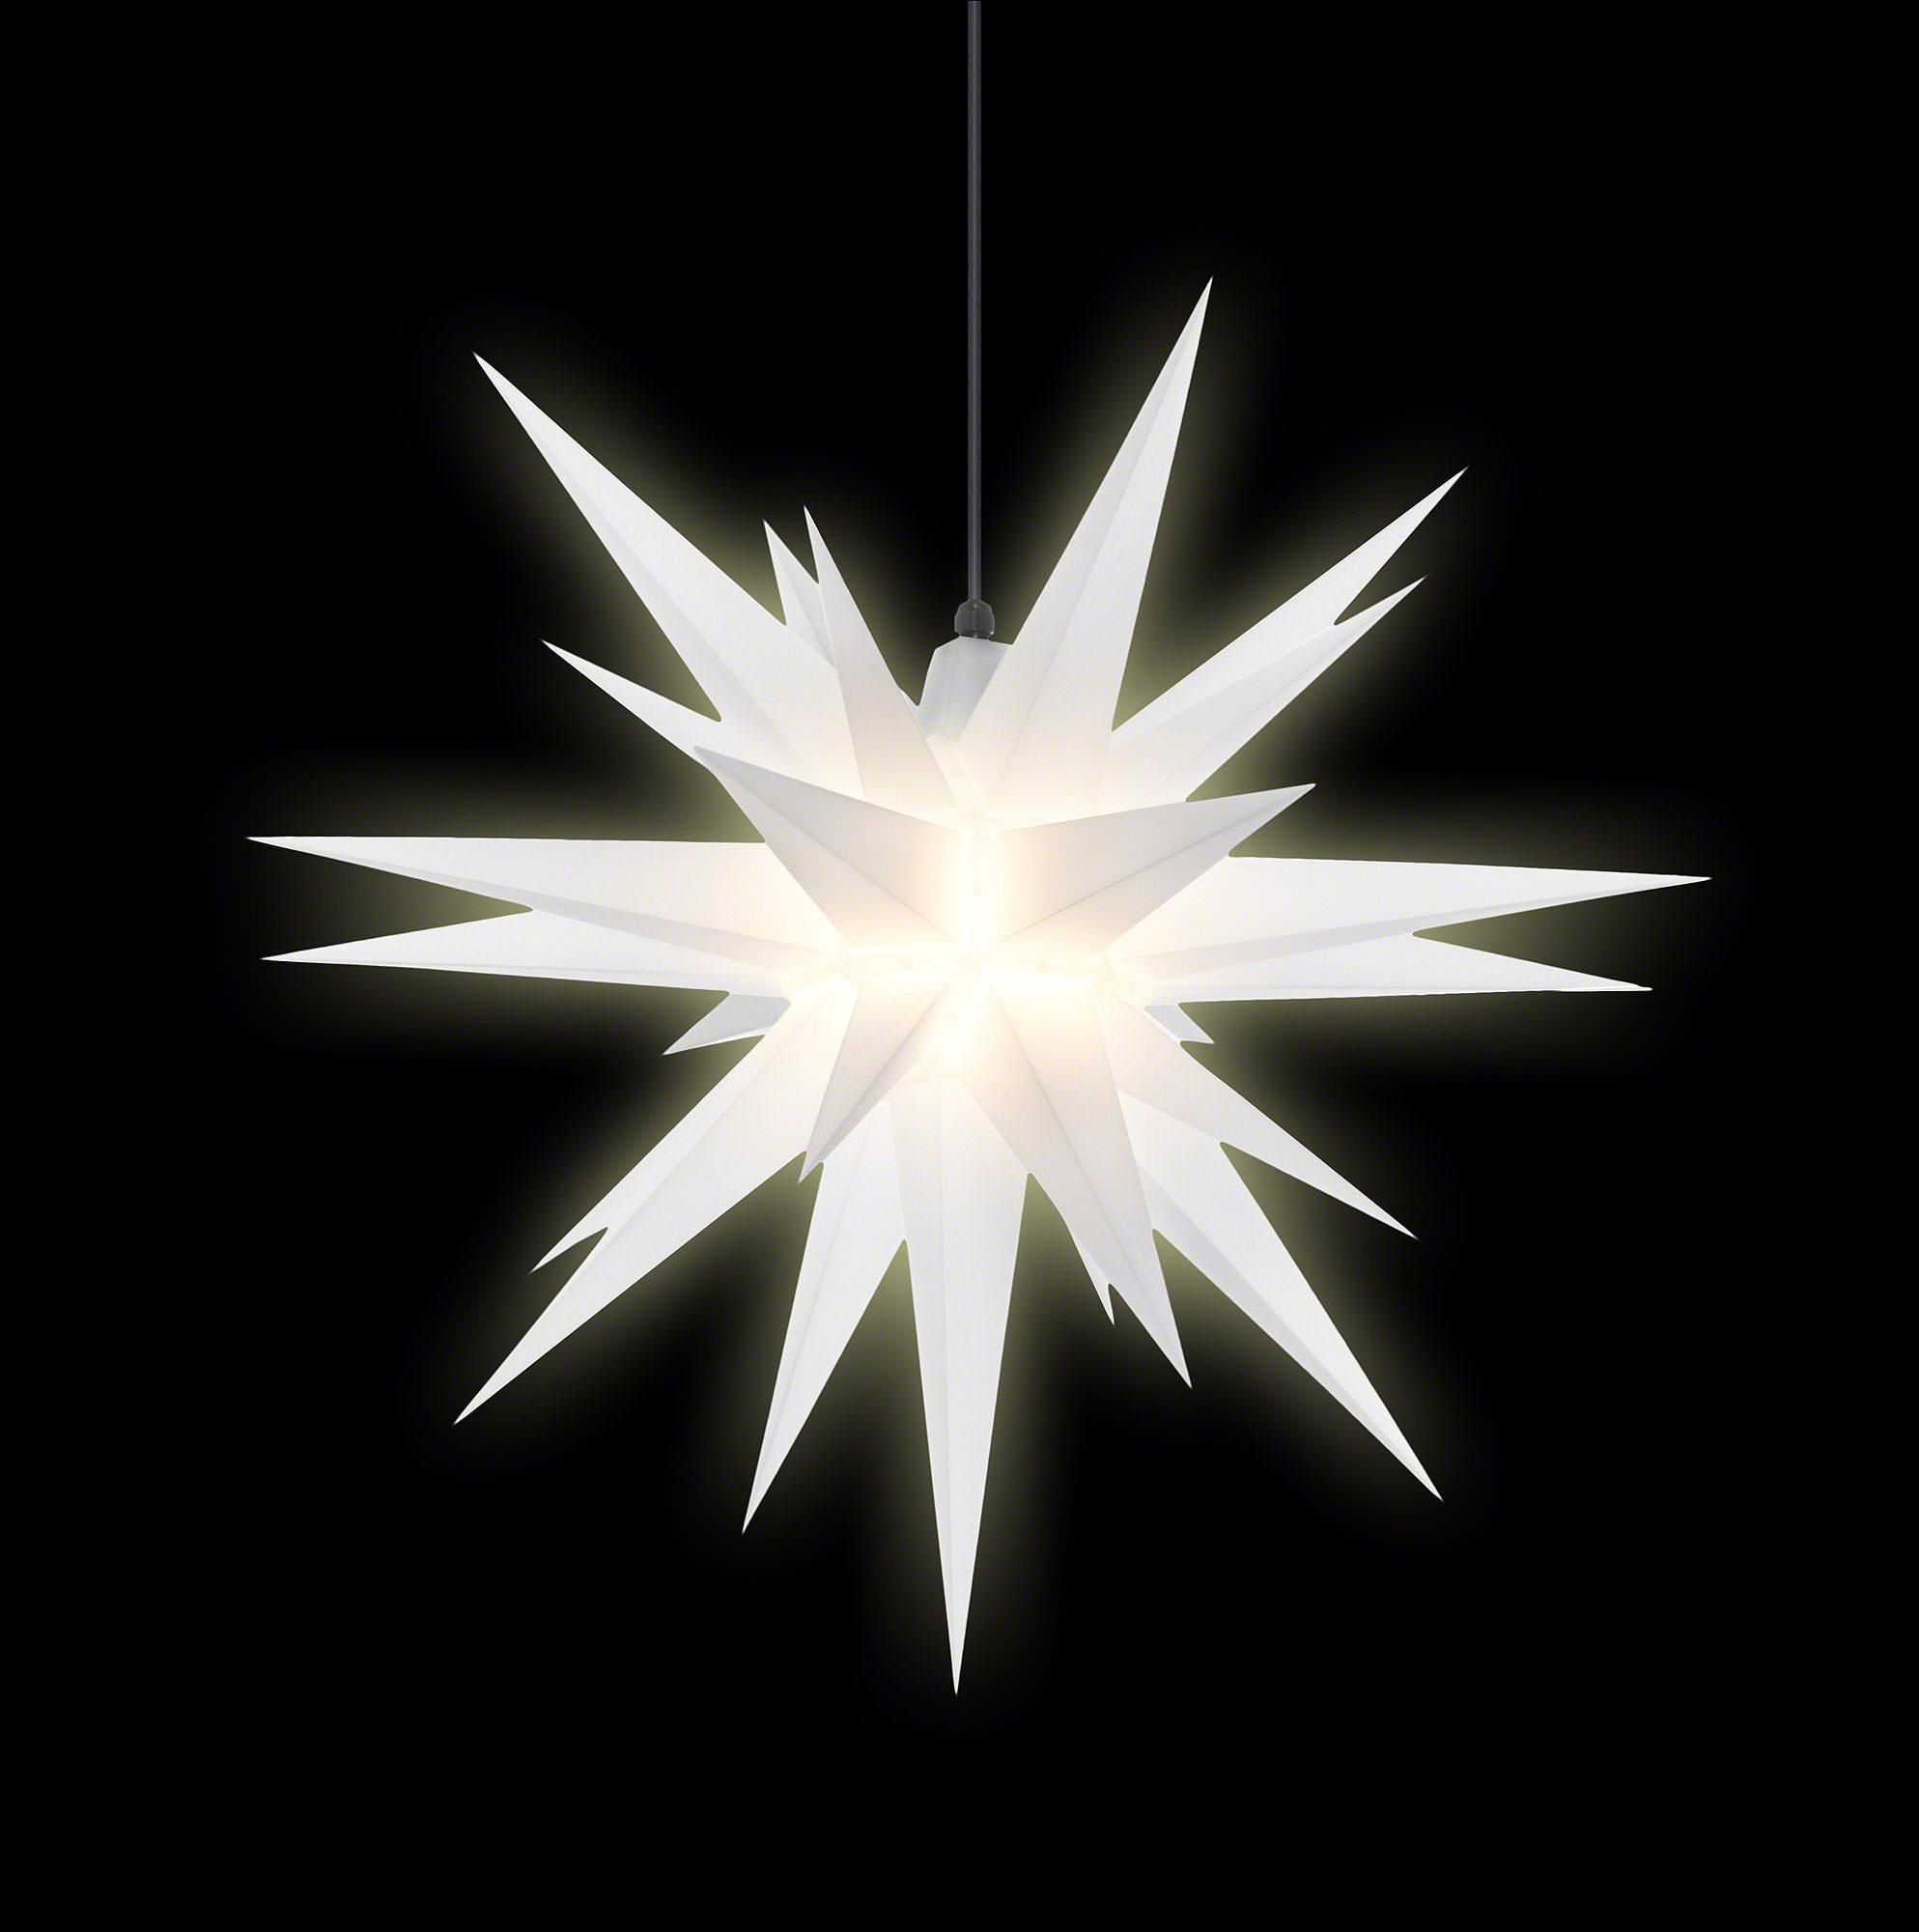 herrnhuter moravian star a7 opal plastic 68cm 27in by herrnhuter sterne. Black Bedroom Furniture Sets. Home Design Ideas